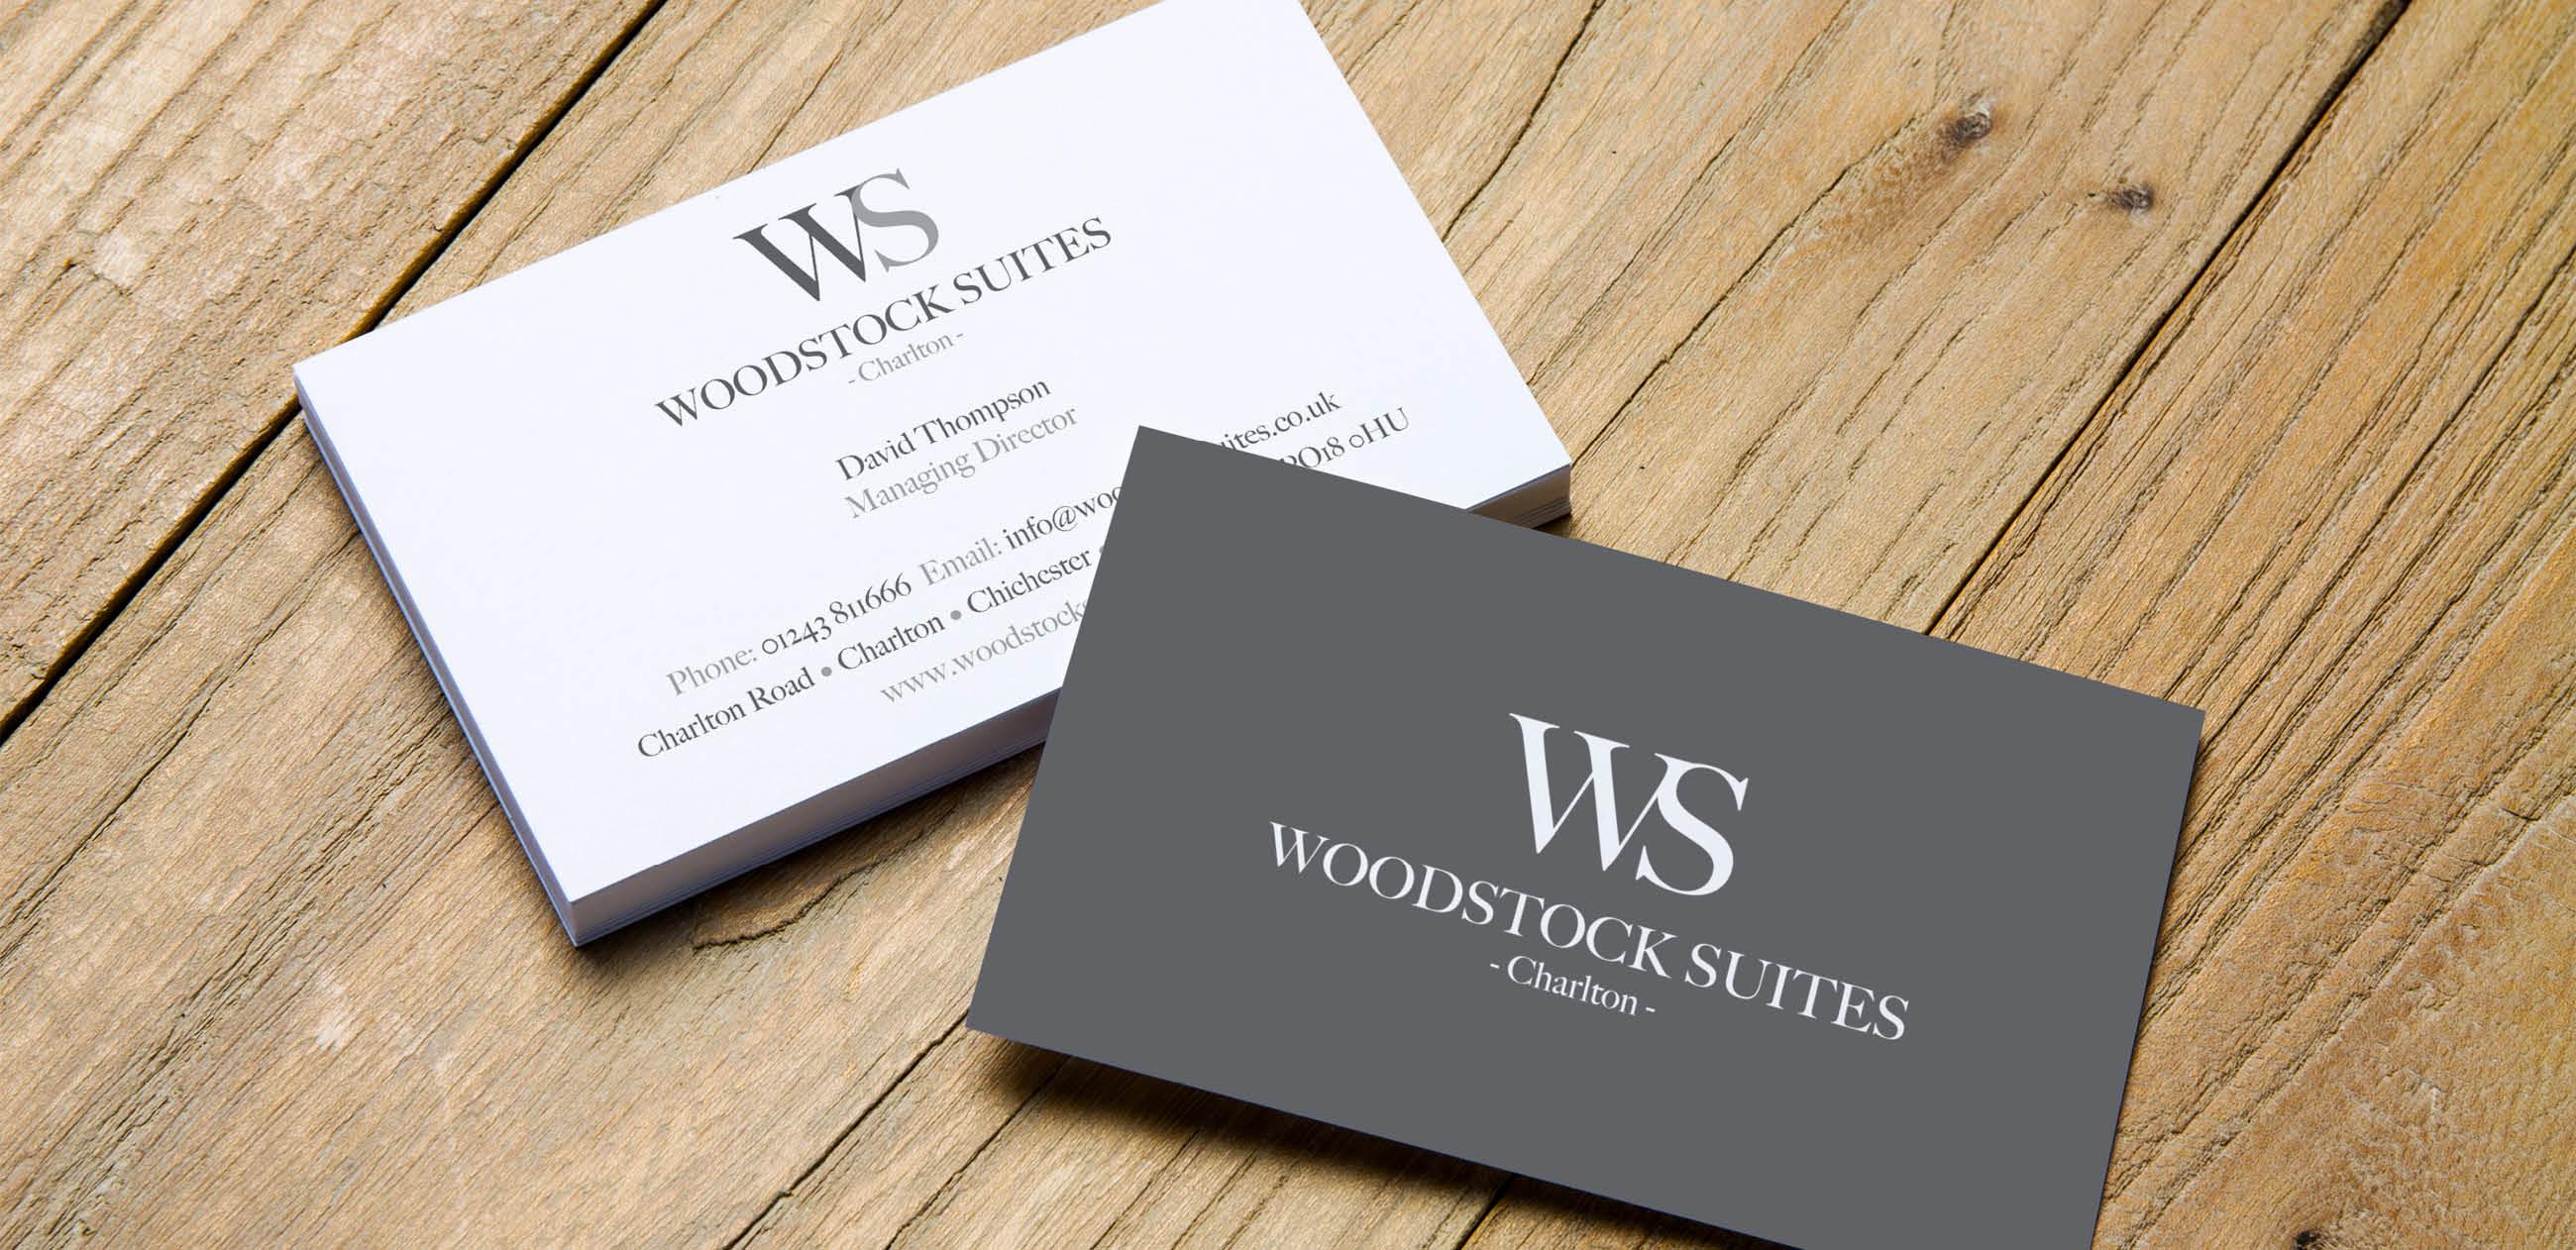 woodstocksuites-branddesign-3